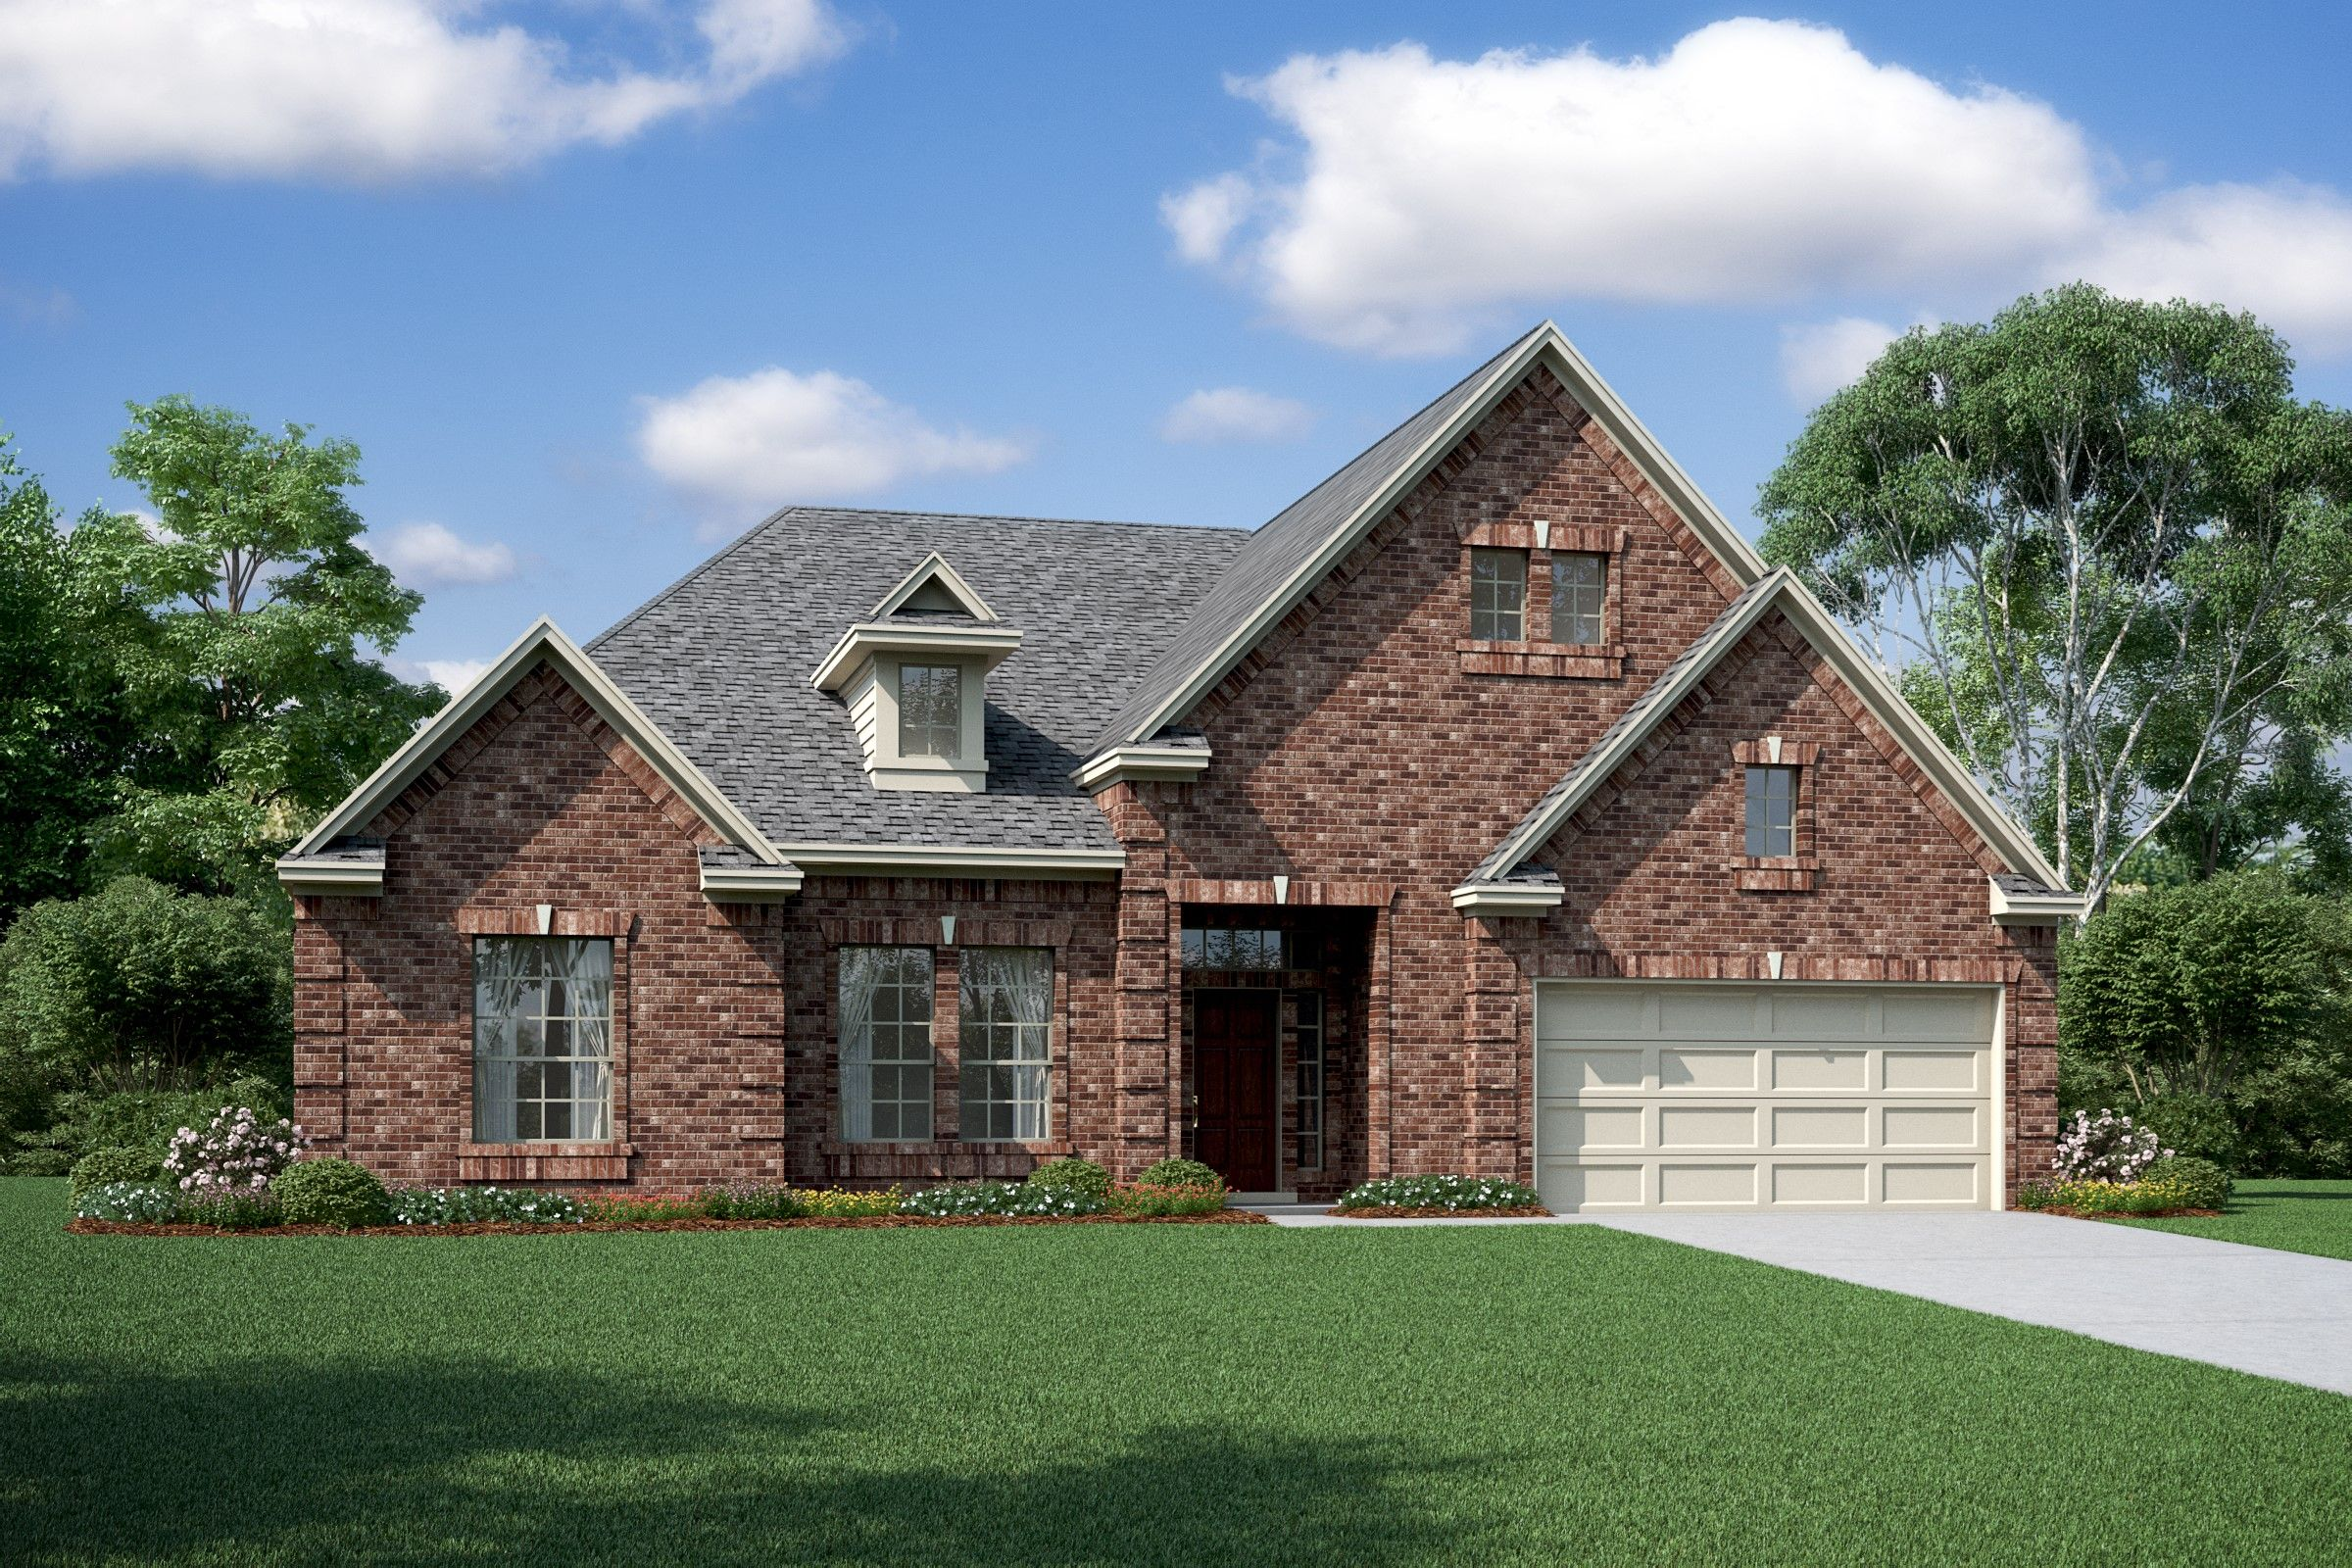 Single Family for Sale at Thunder Bay - Samuel Mccollum Park Rd & Thunder Bay Beach City, Texas 77523 United States